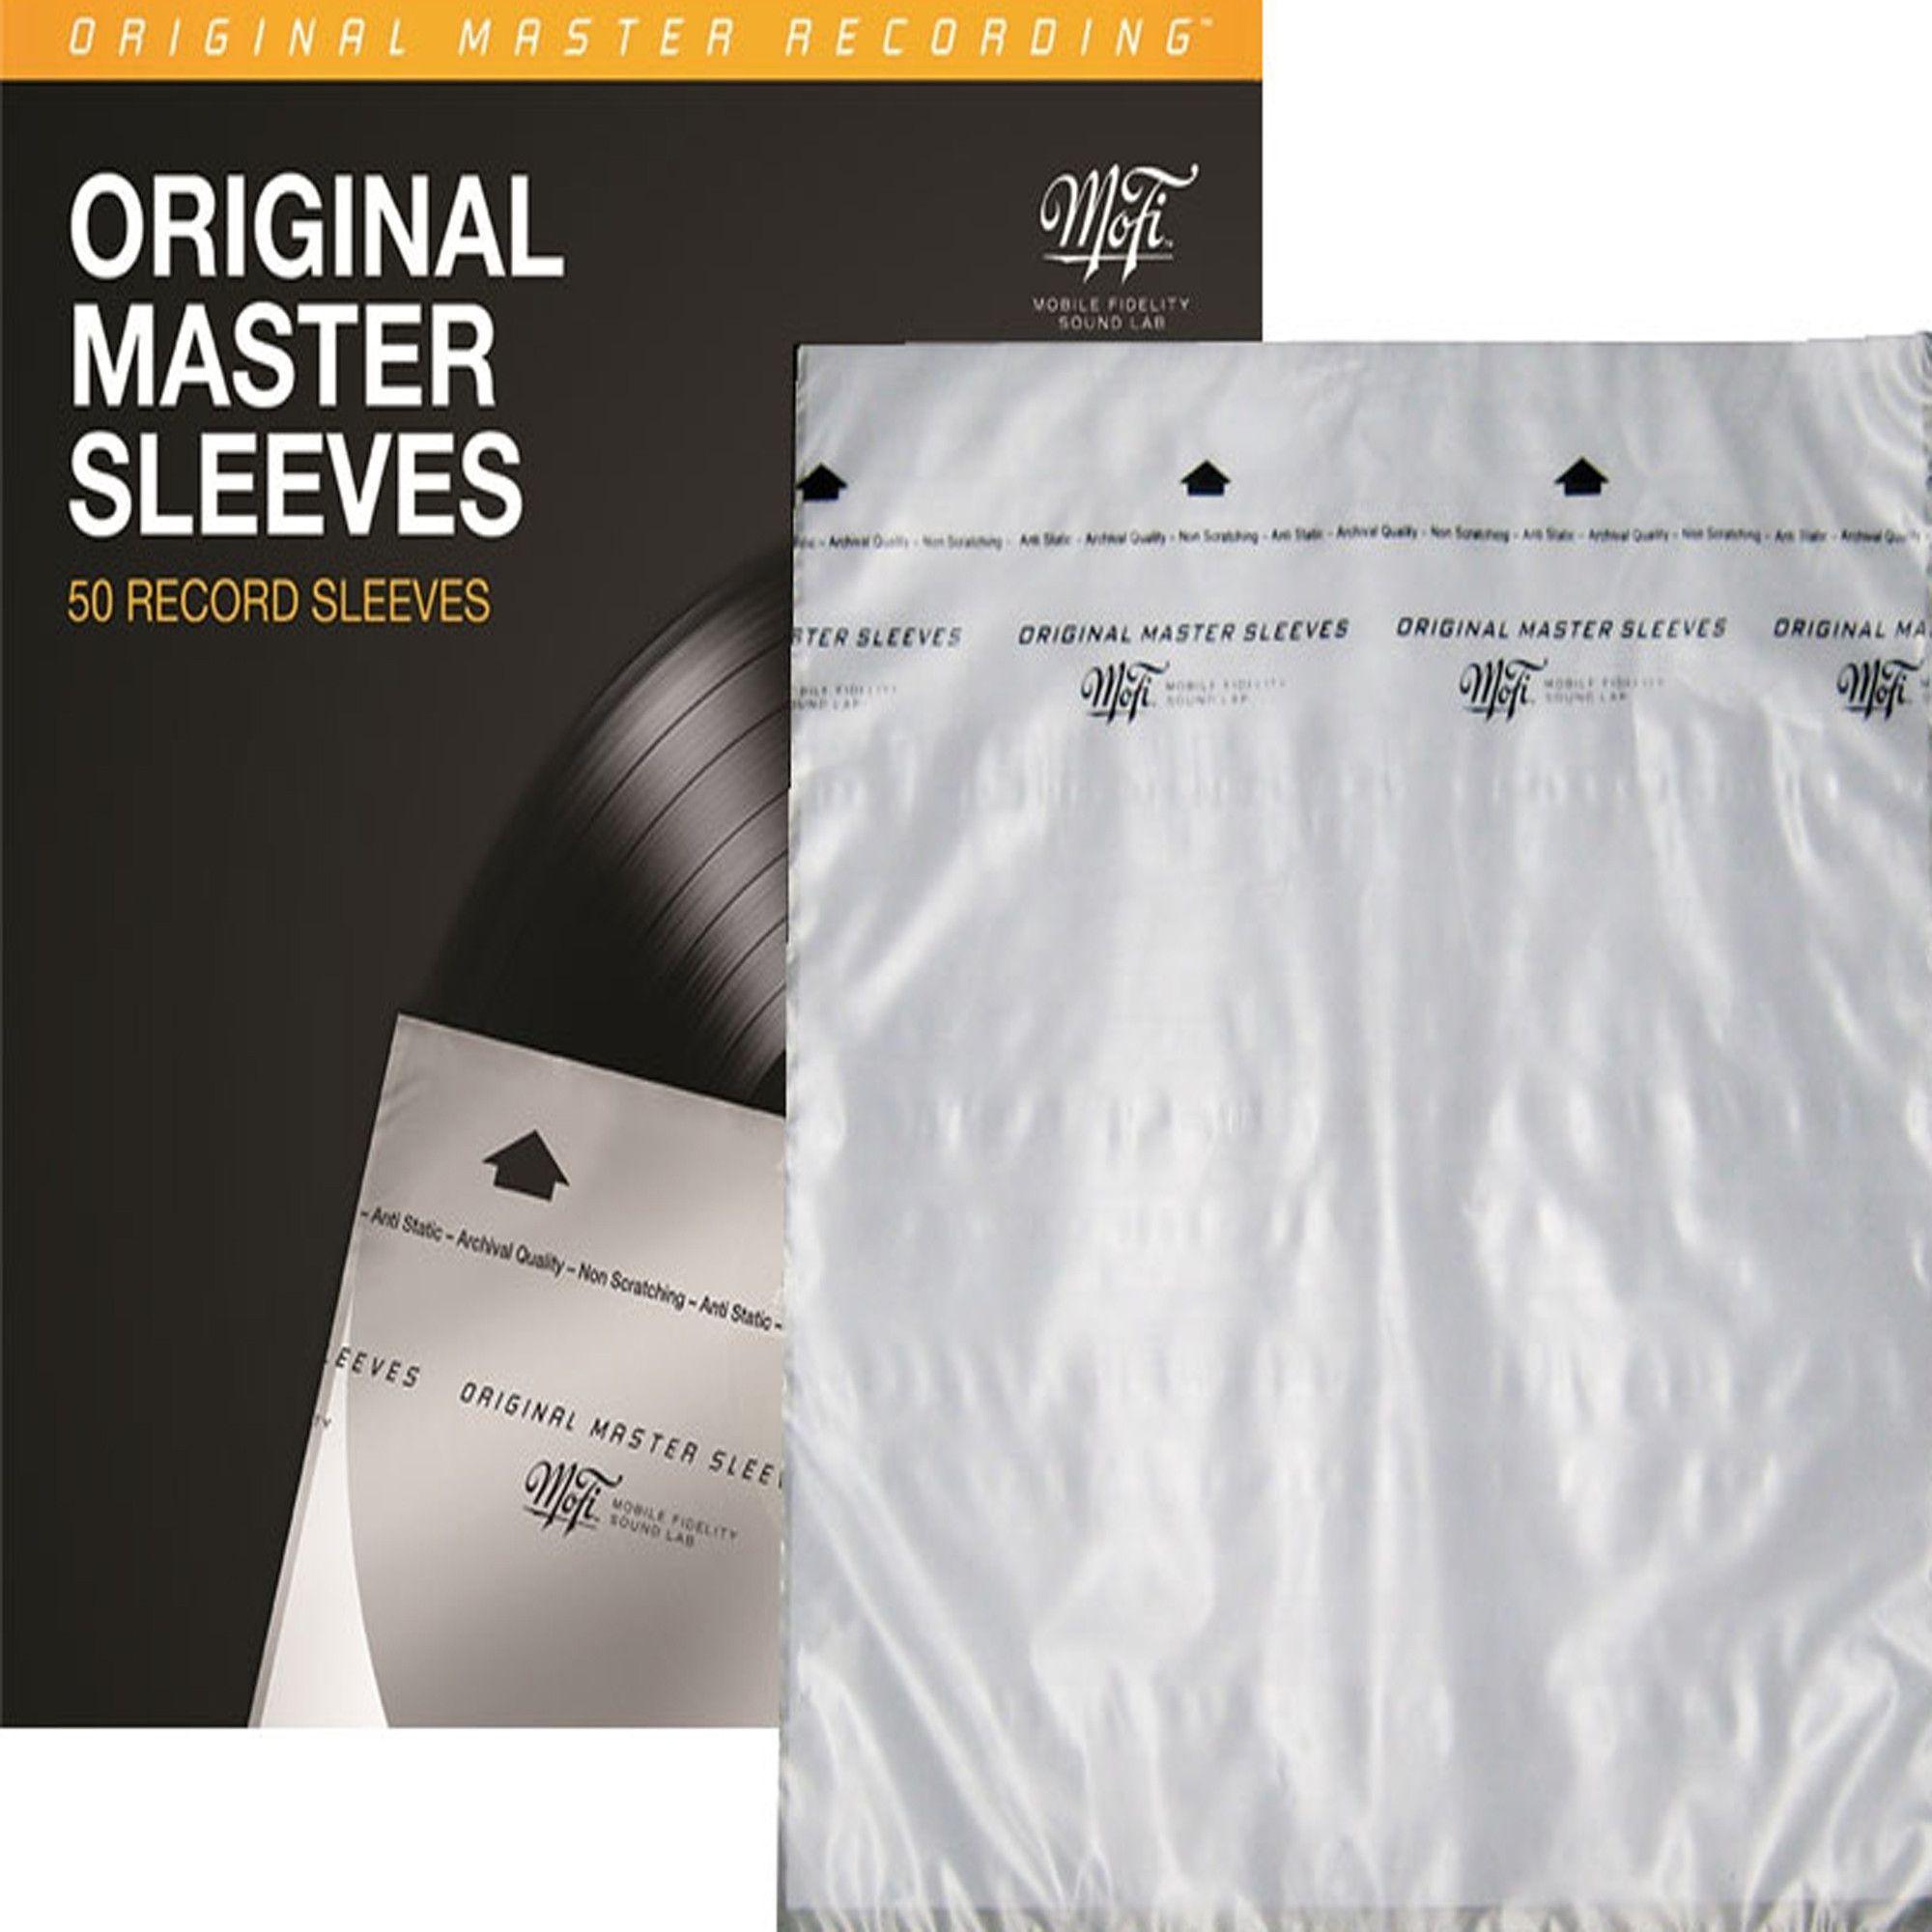 Mobile Fidelity Mfsl Mofi Original Master Record Inner Sleeves 50 Per Pack The Originals Vinyl Records Sleeves